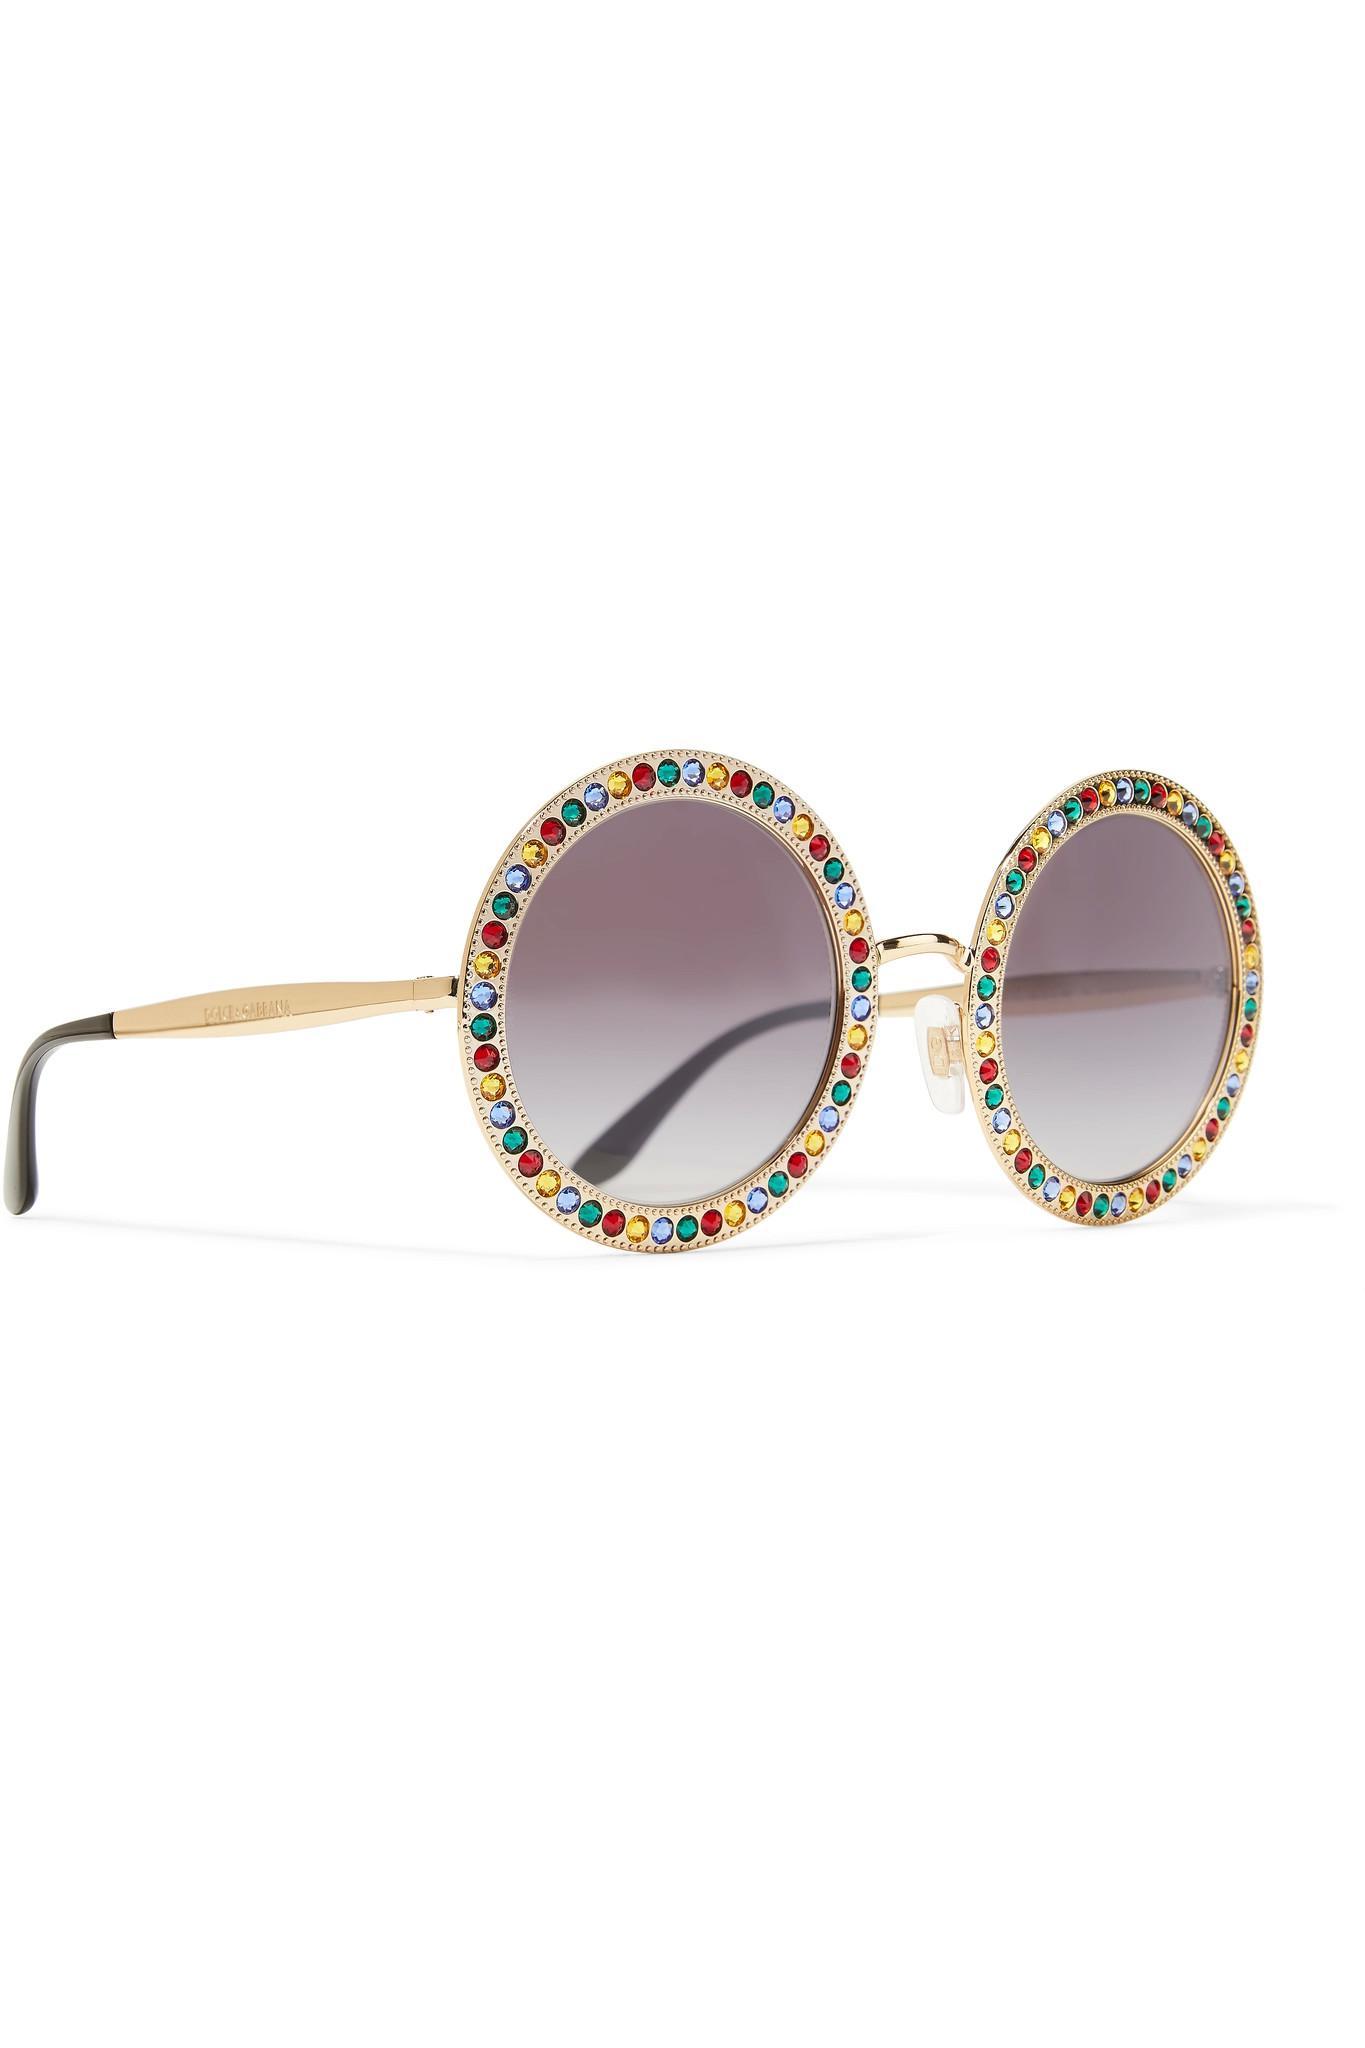 44133c1df690 Lyst - Dolce   Gabbana Crystal-embellished Round-frame Gold-tone ...